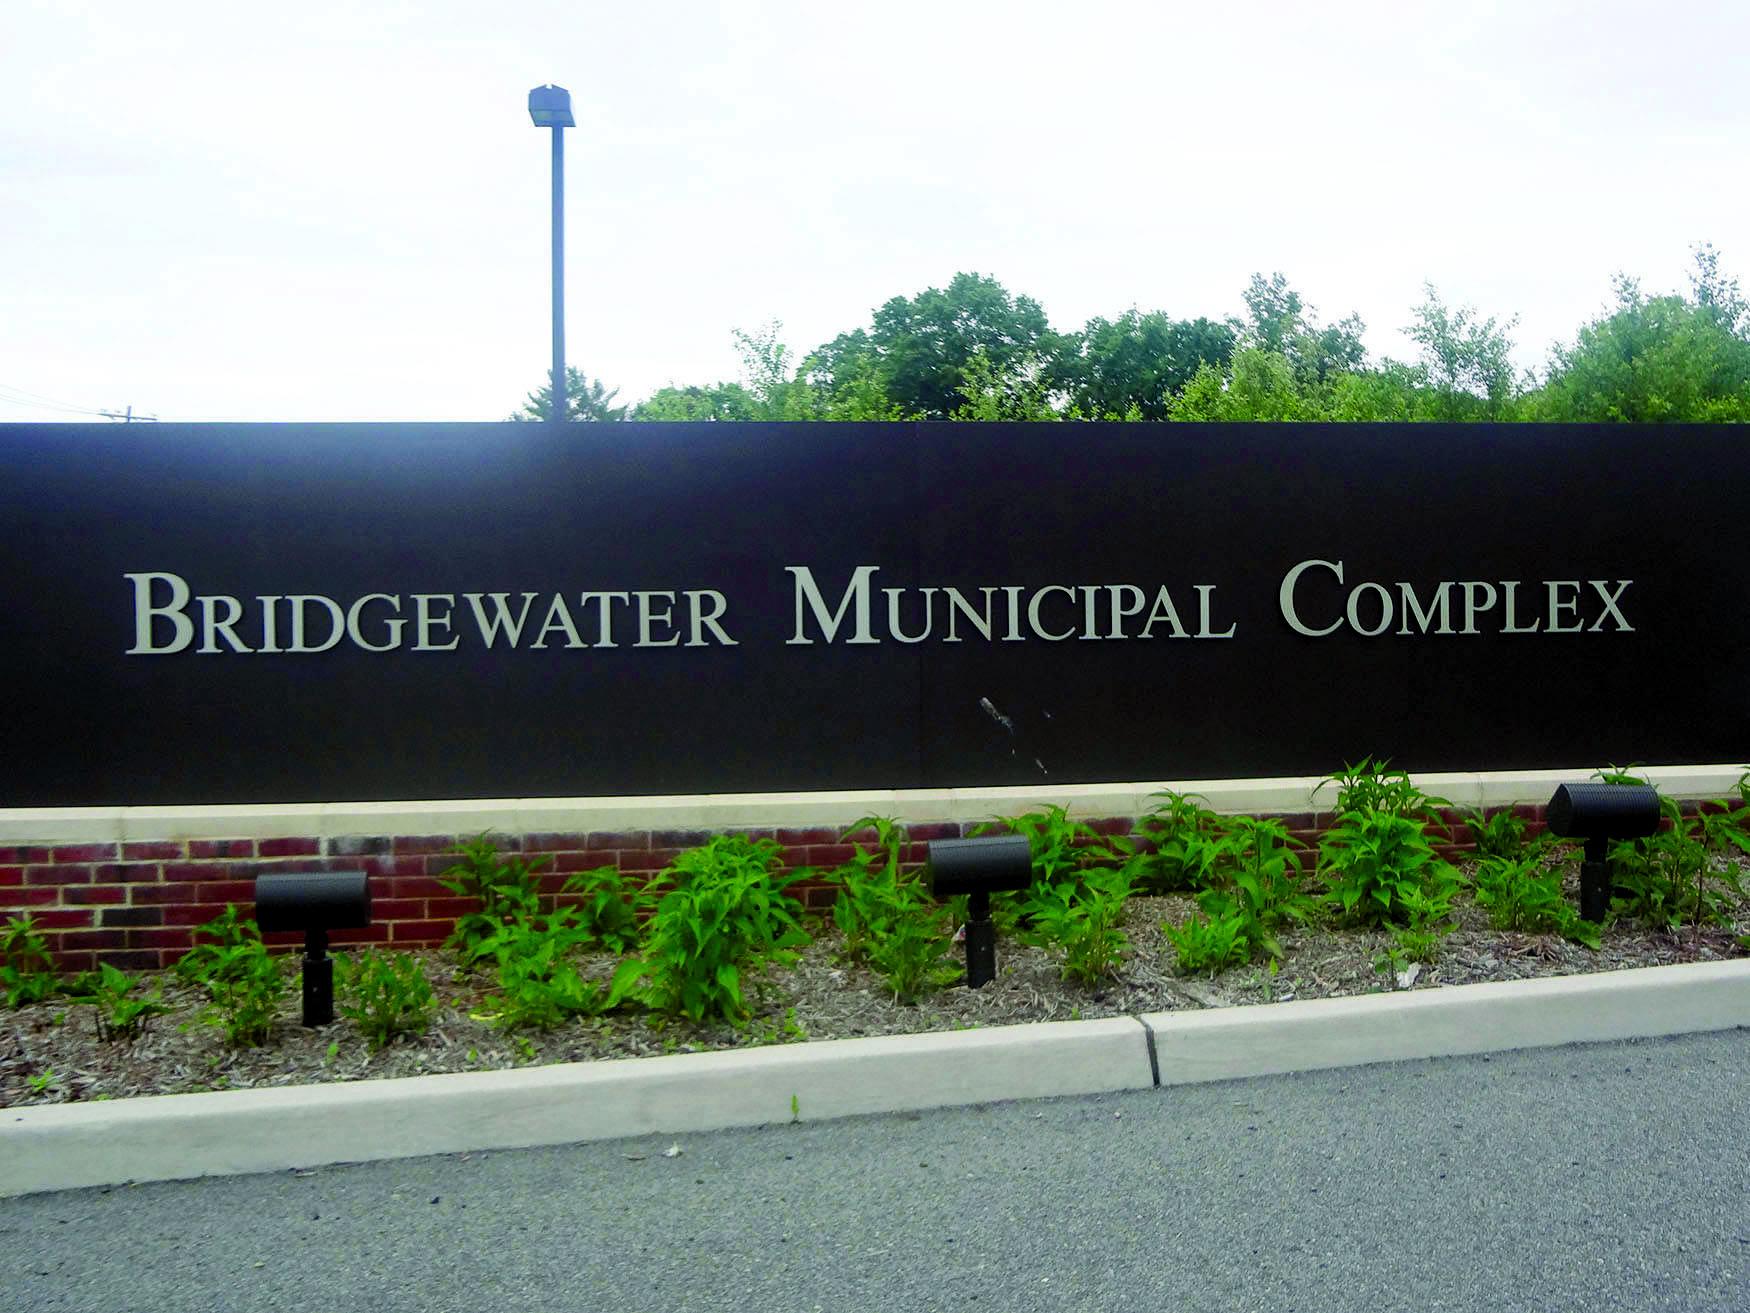 df21b0749d82c1c02e2c_Bridgewater_municipal.jpg